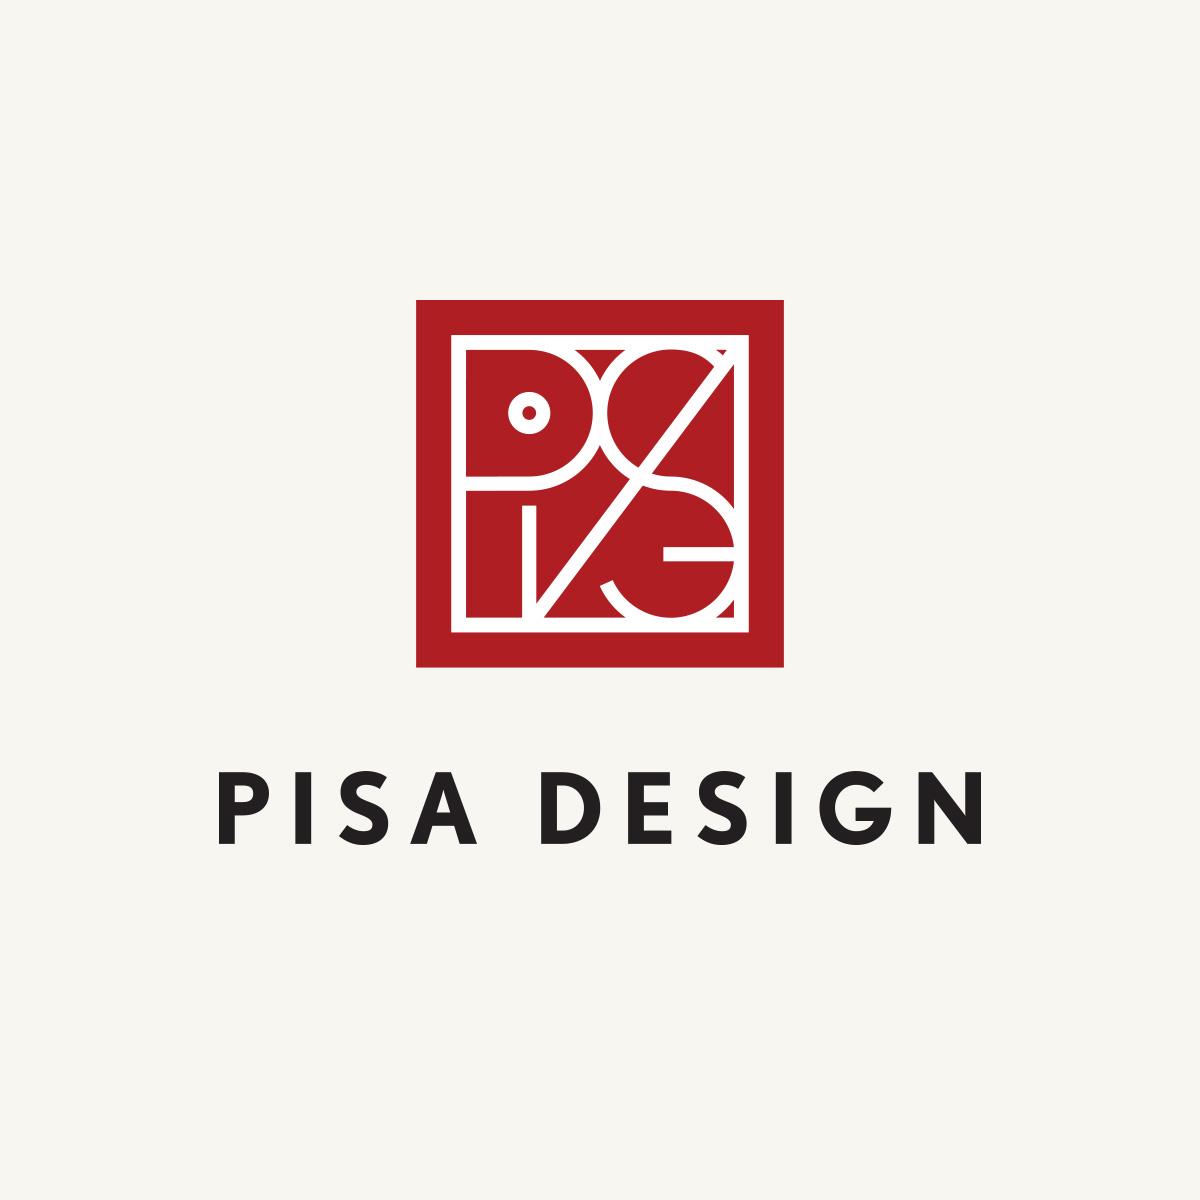 Pisa_Design.jpg